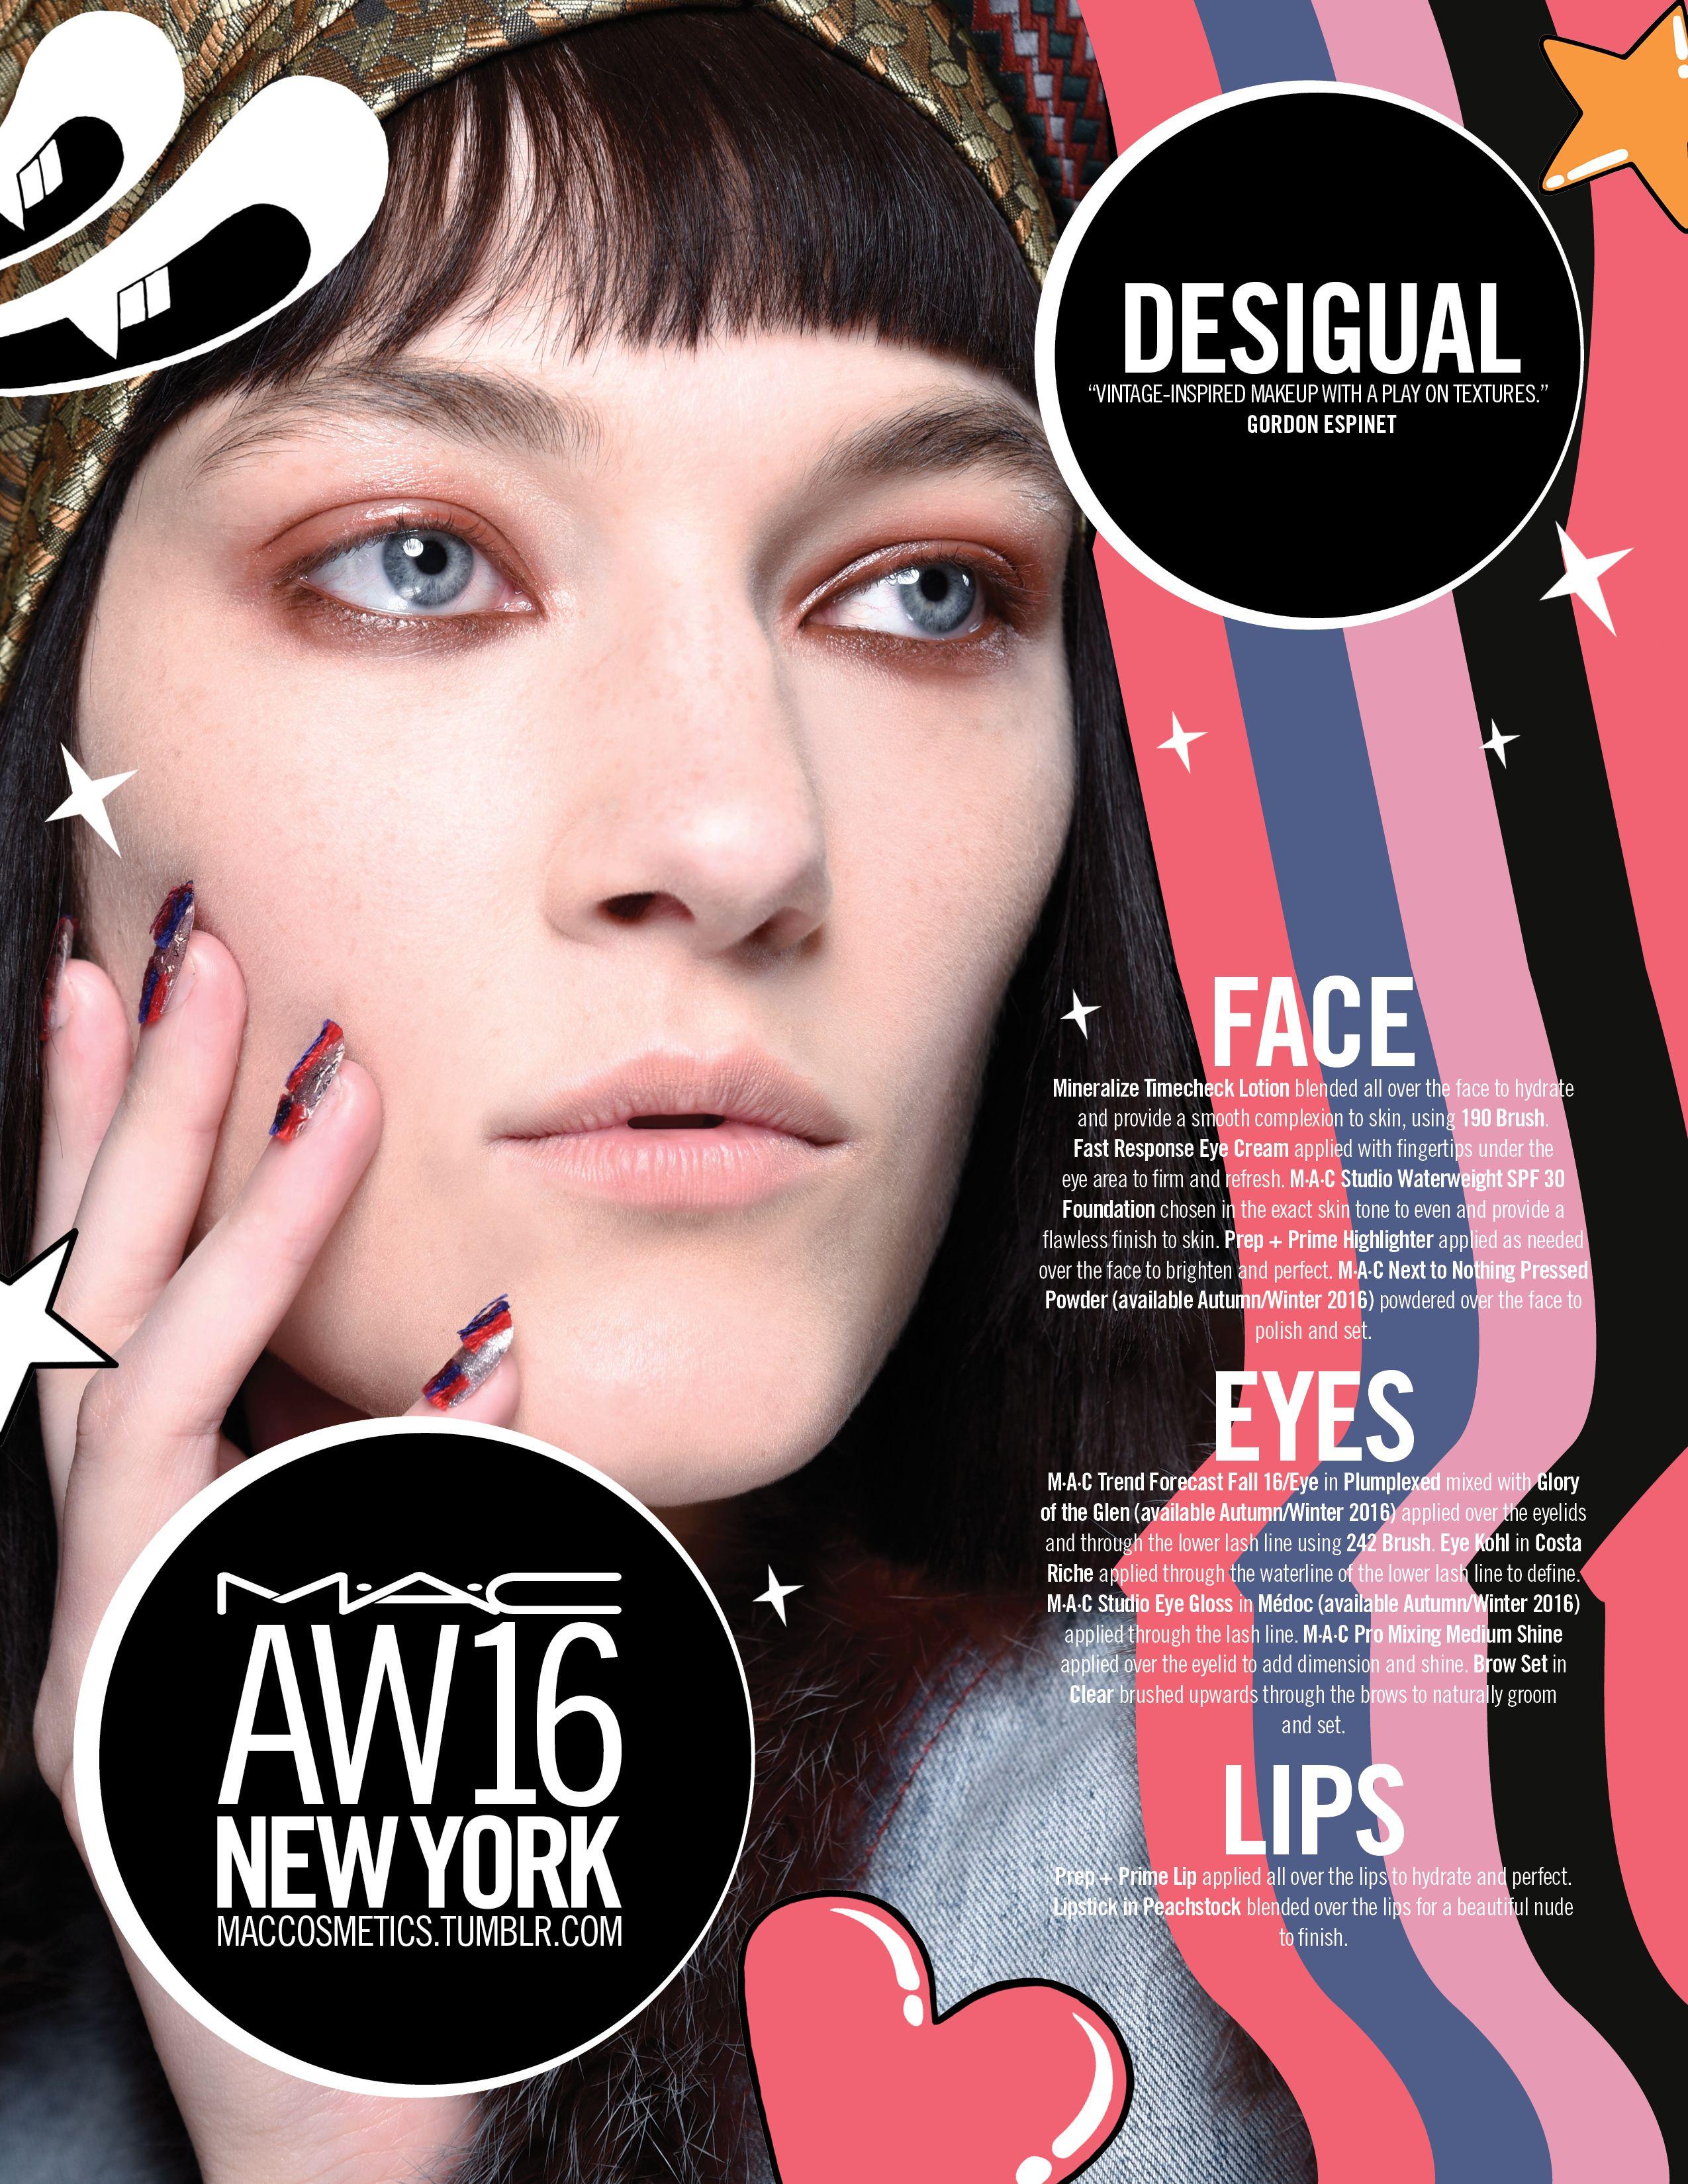 Kohl Eye Liner Matte Eye Pencil Makeup, Makeup forever